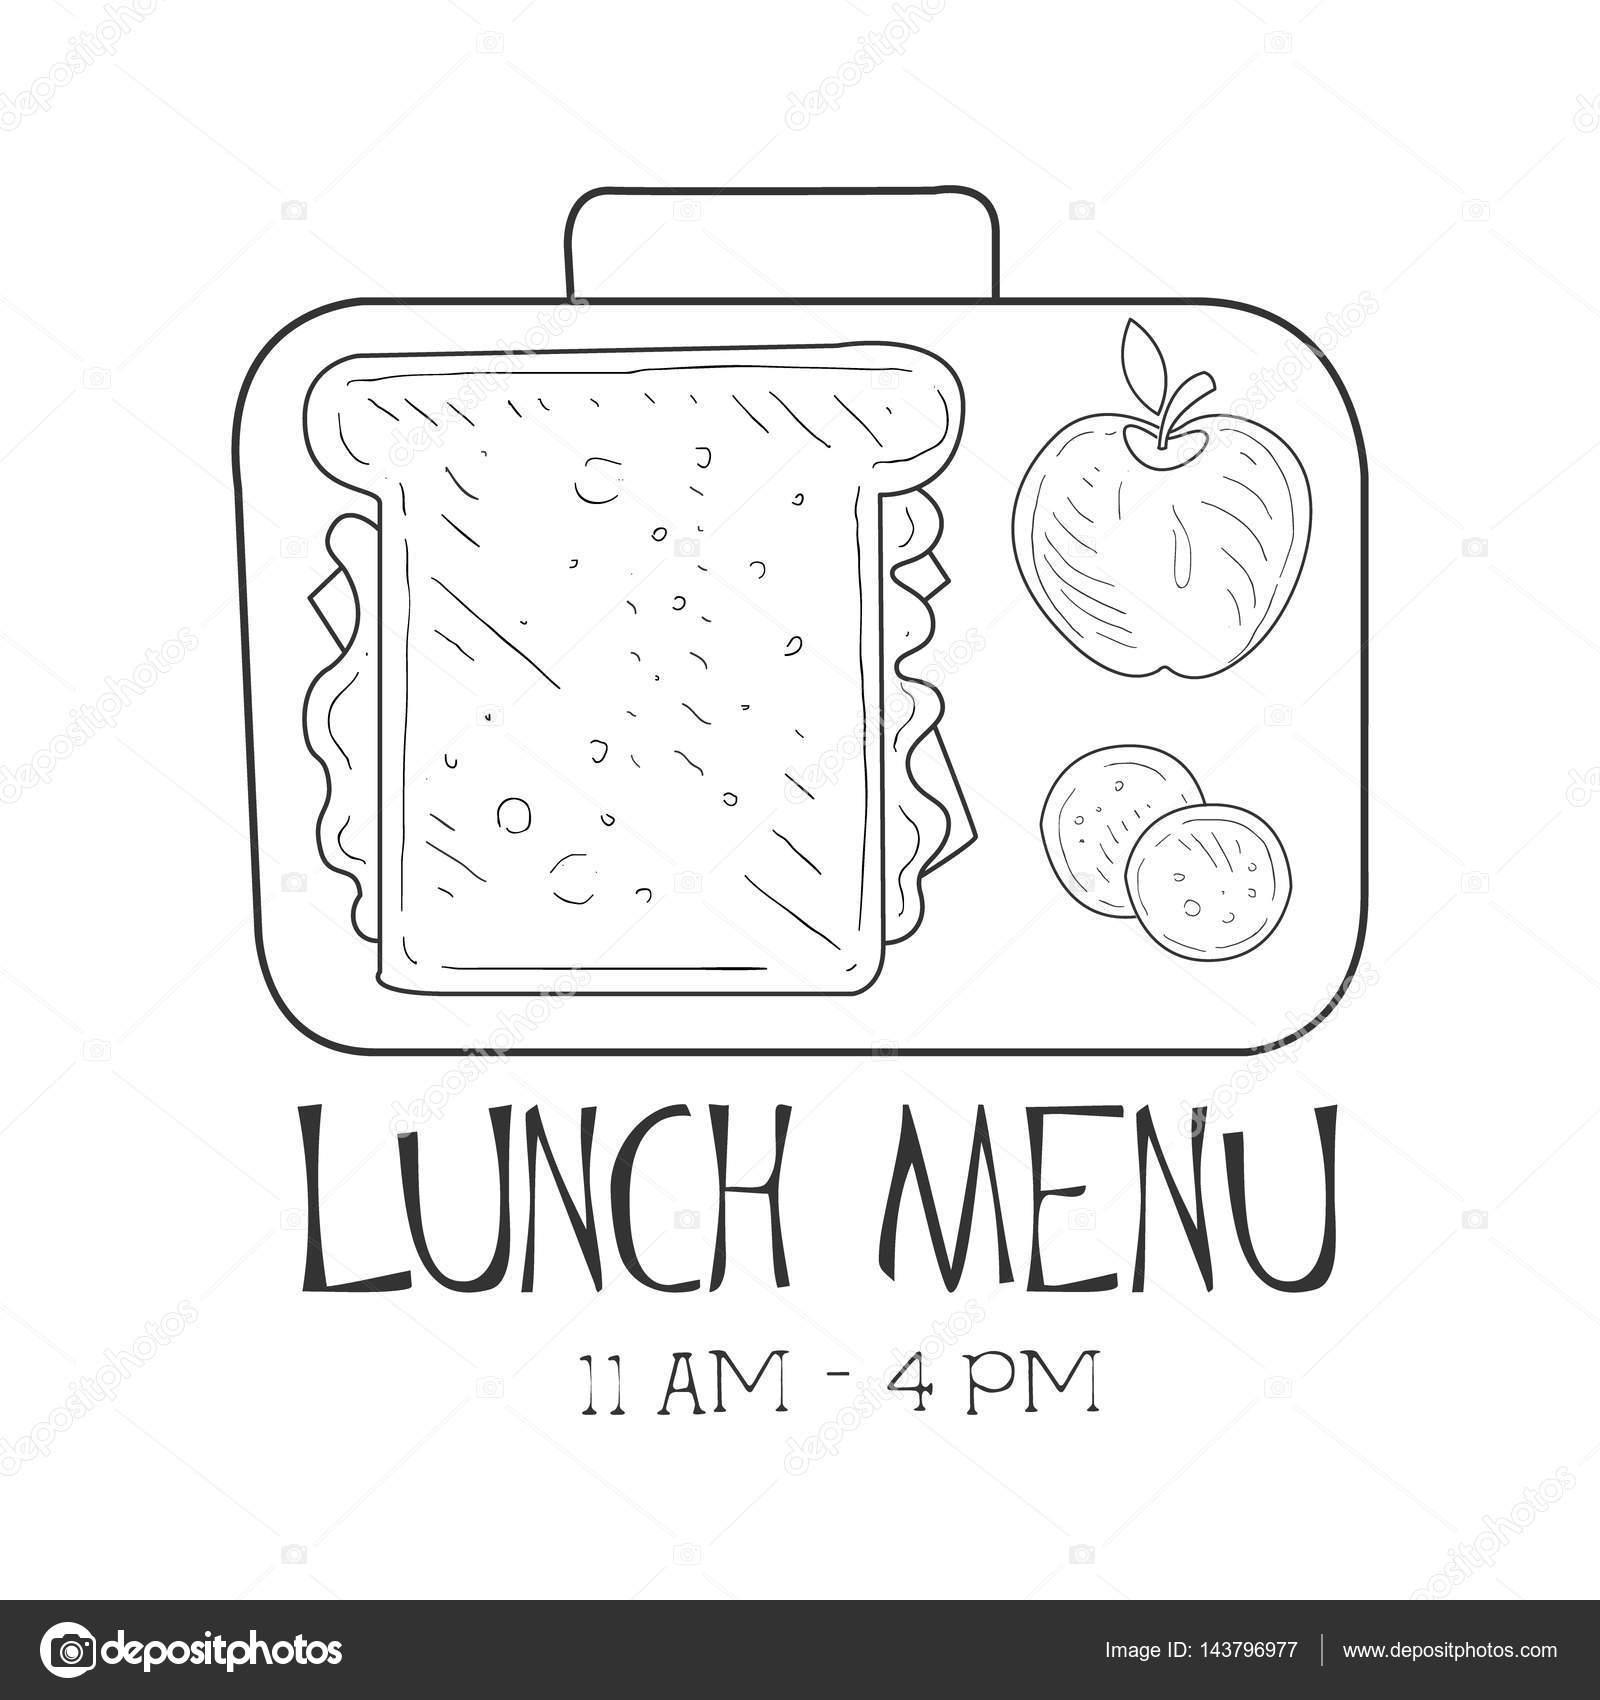 Schule Lunchbox Cafe Lunch Menü Promo anmelden Skizze Stil, Design ...